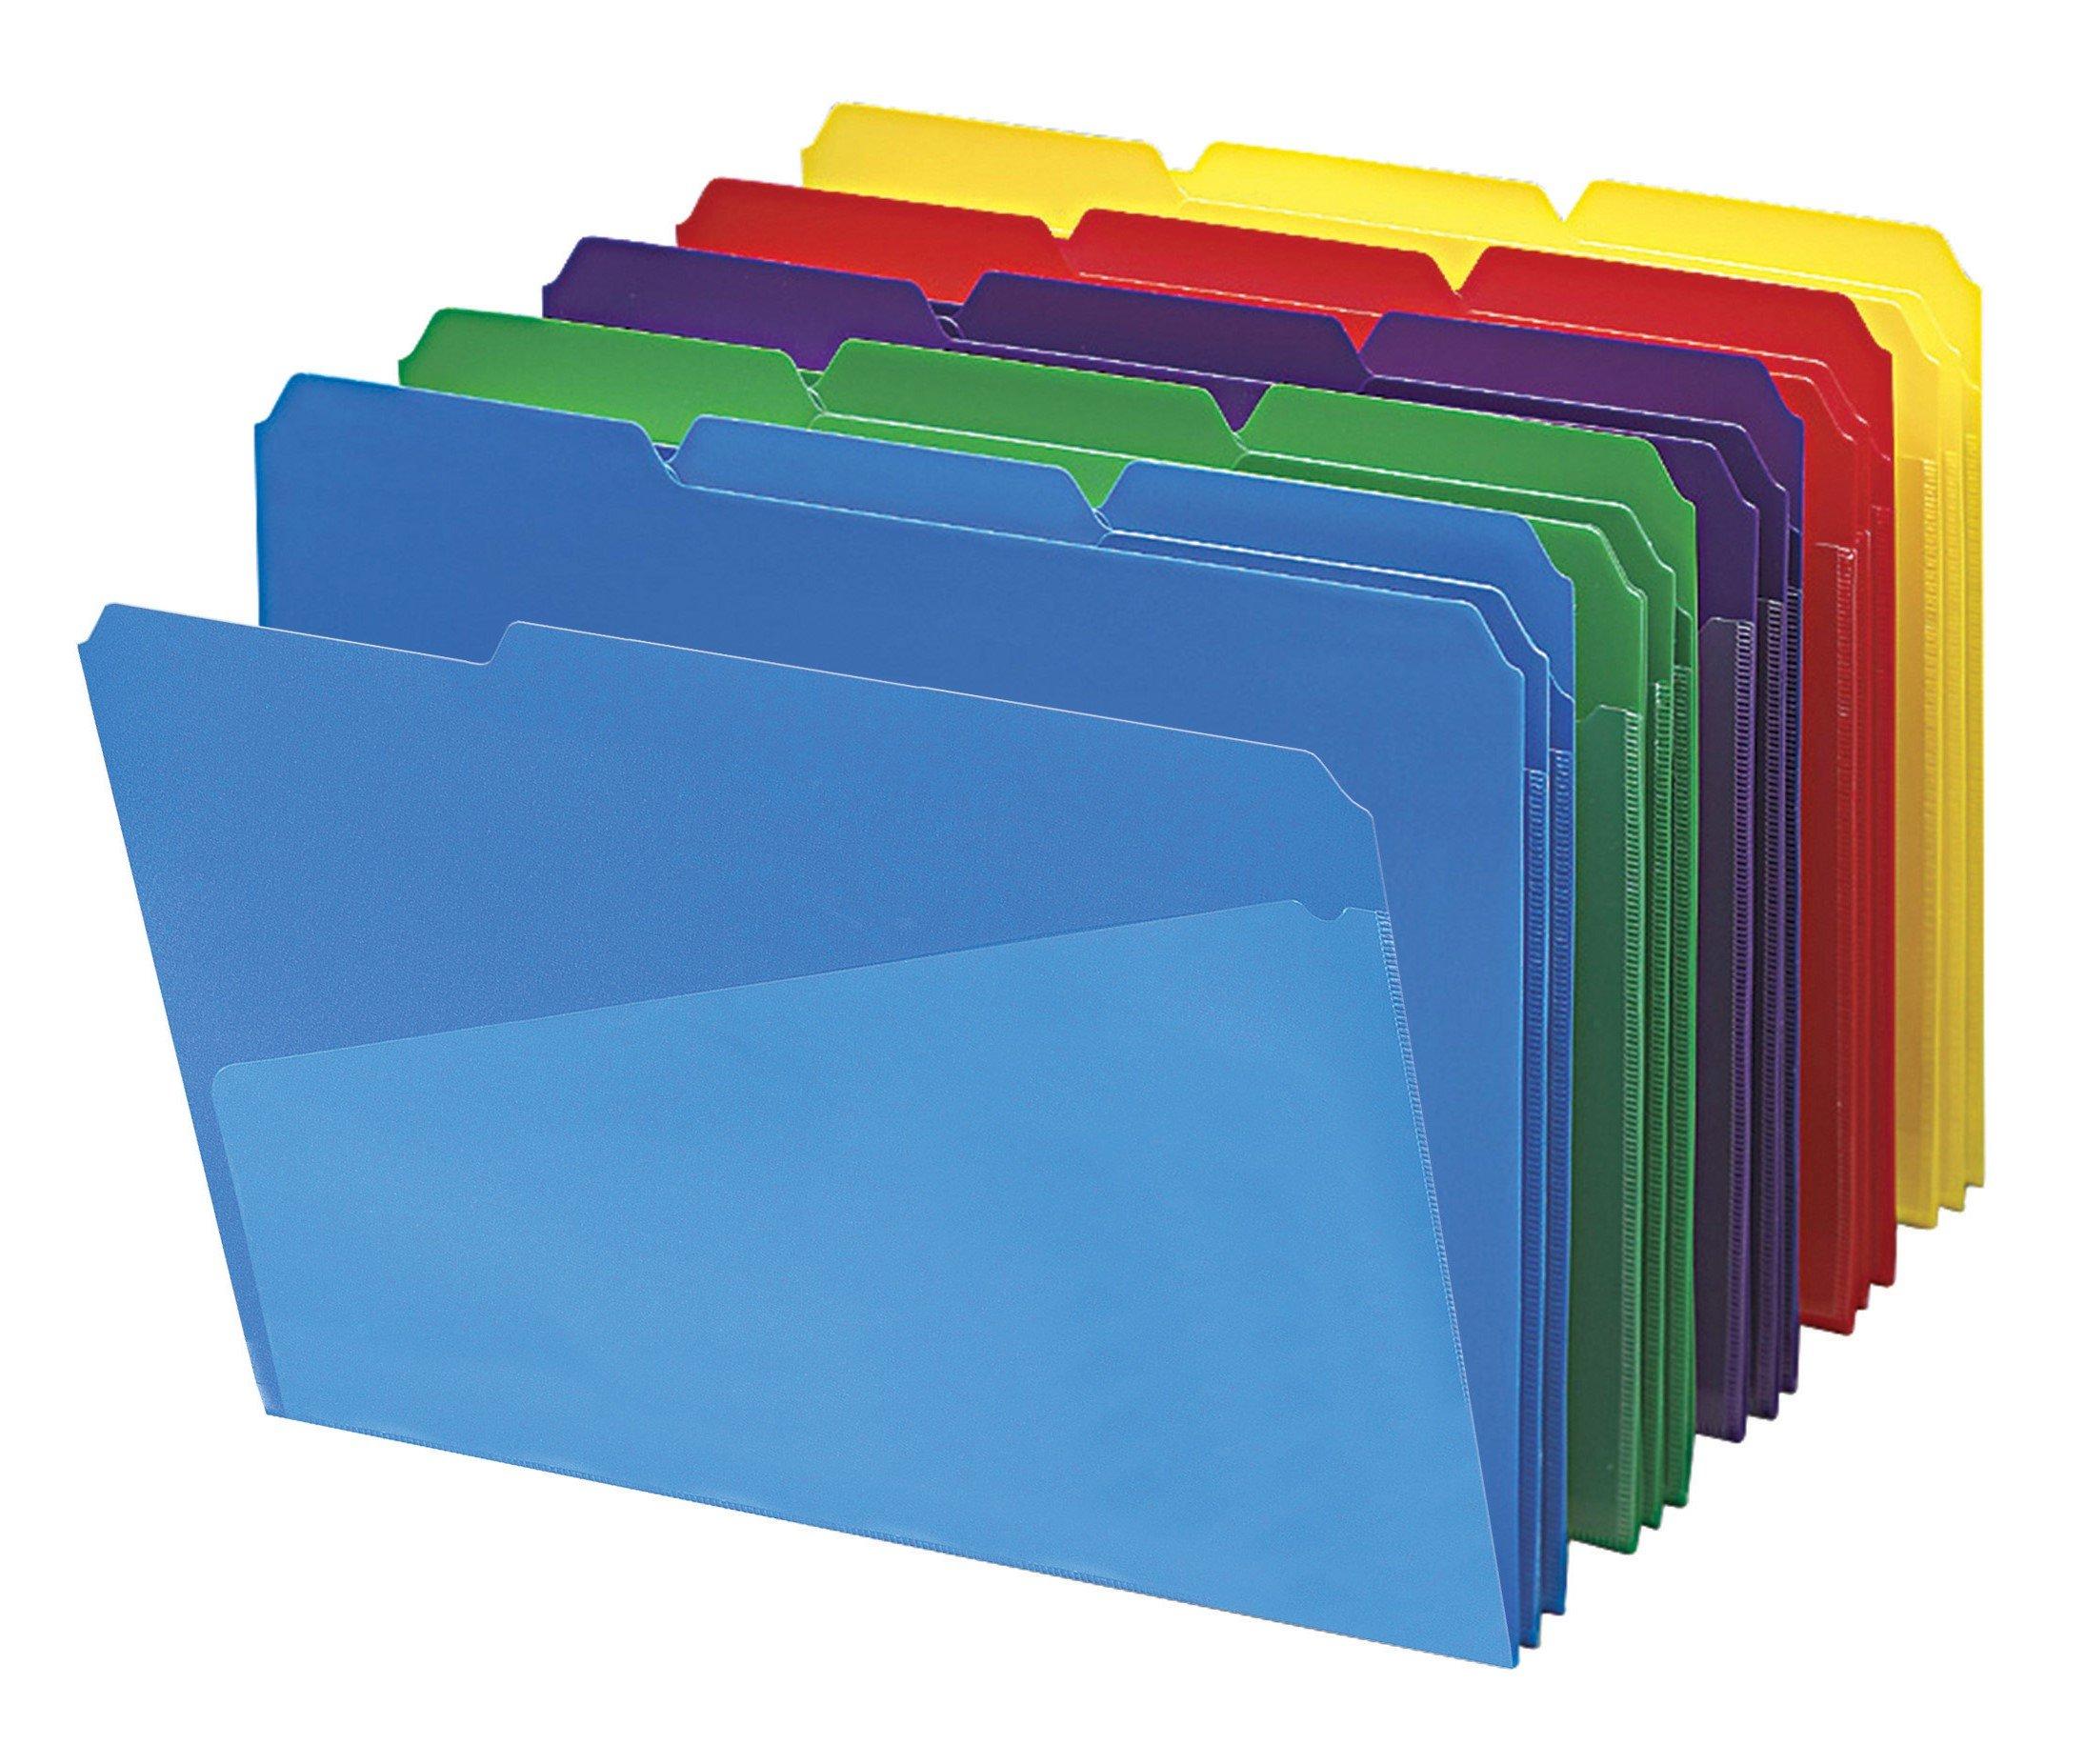 Smead 10540 Slash Pocket Poly File Folders, 1/3 Cut Top Tab, Letter, Assorted (Box of 30)